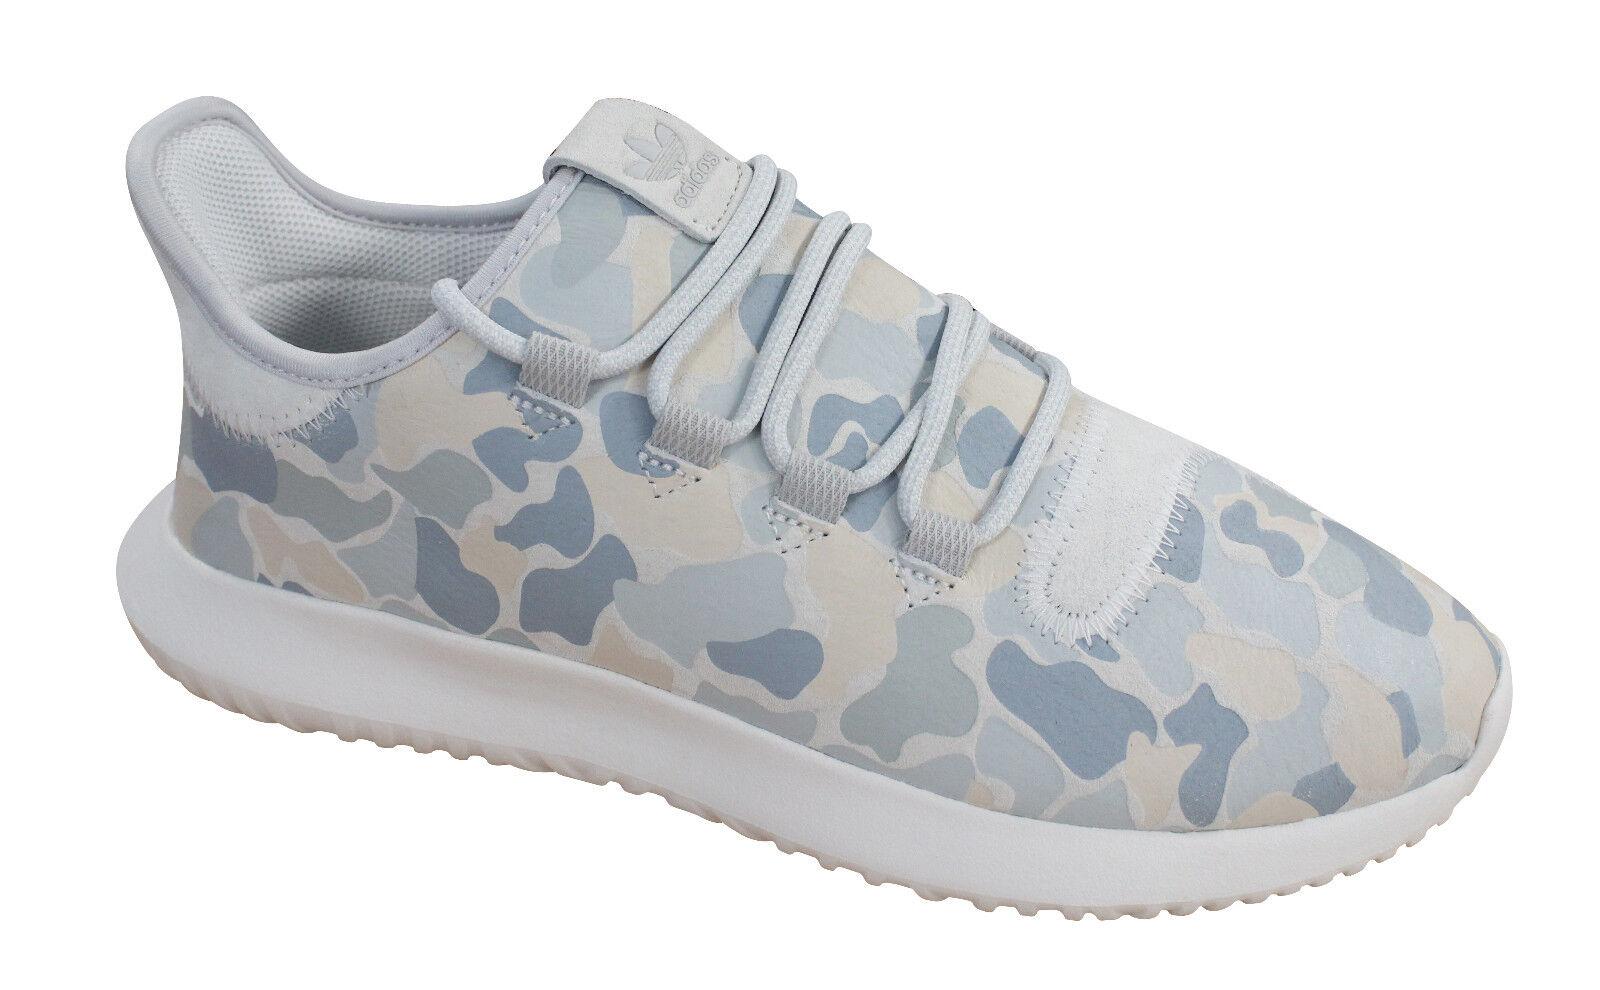 Details about Adidas Originals Tubular Shadow Mens Trainers Lace Up Shoes Textile BB8817 M18